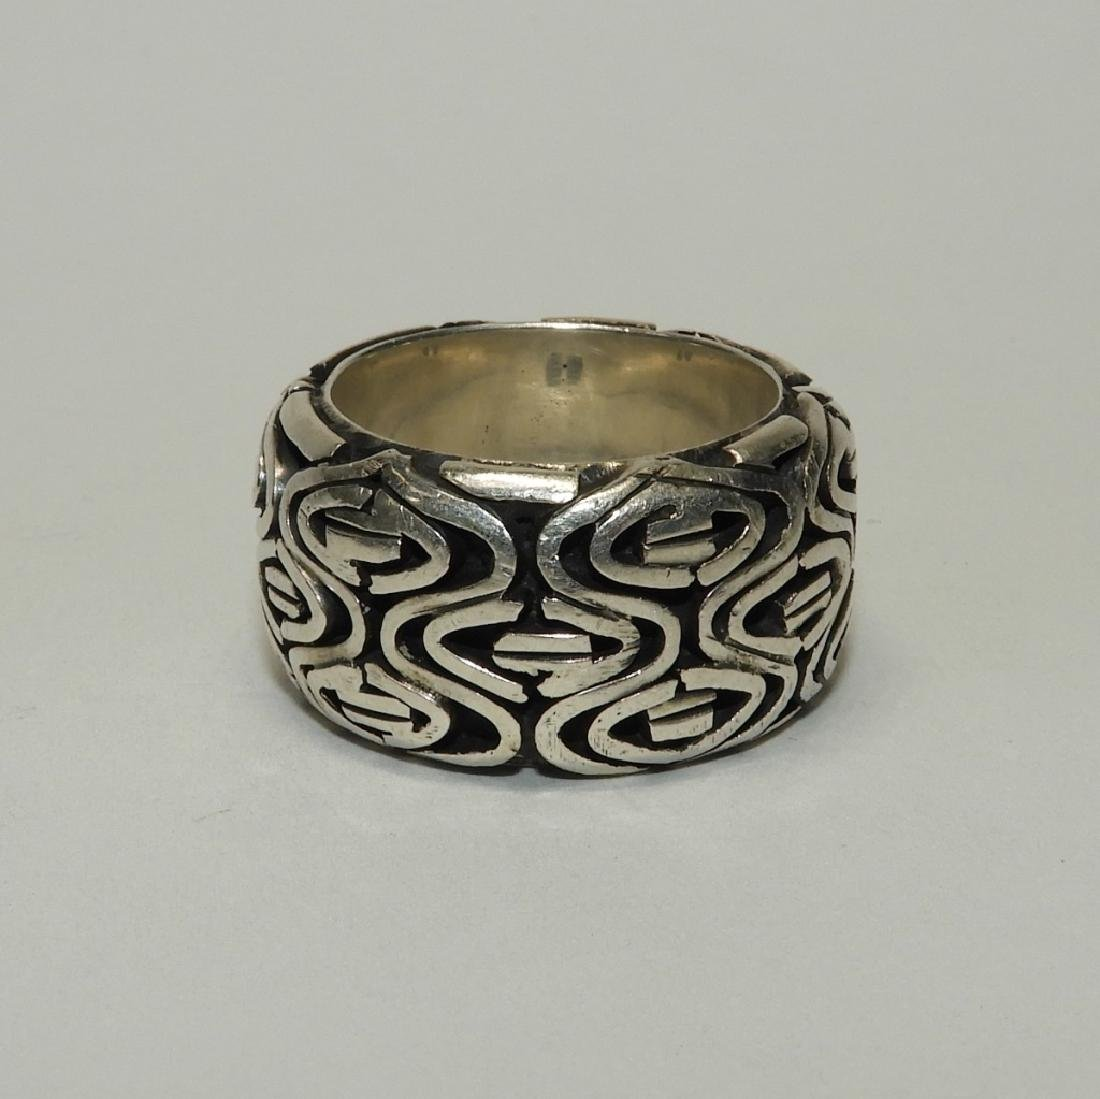 Fine & Heavy Sterling Silver Men's Fashion Ring